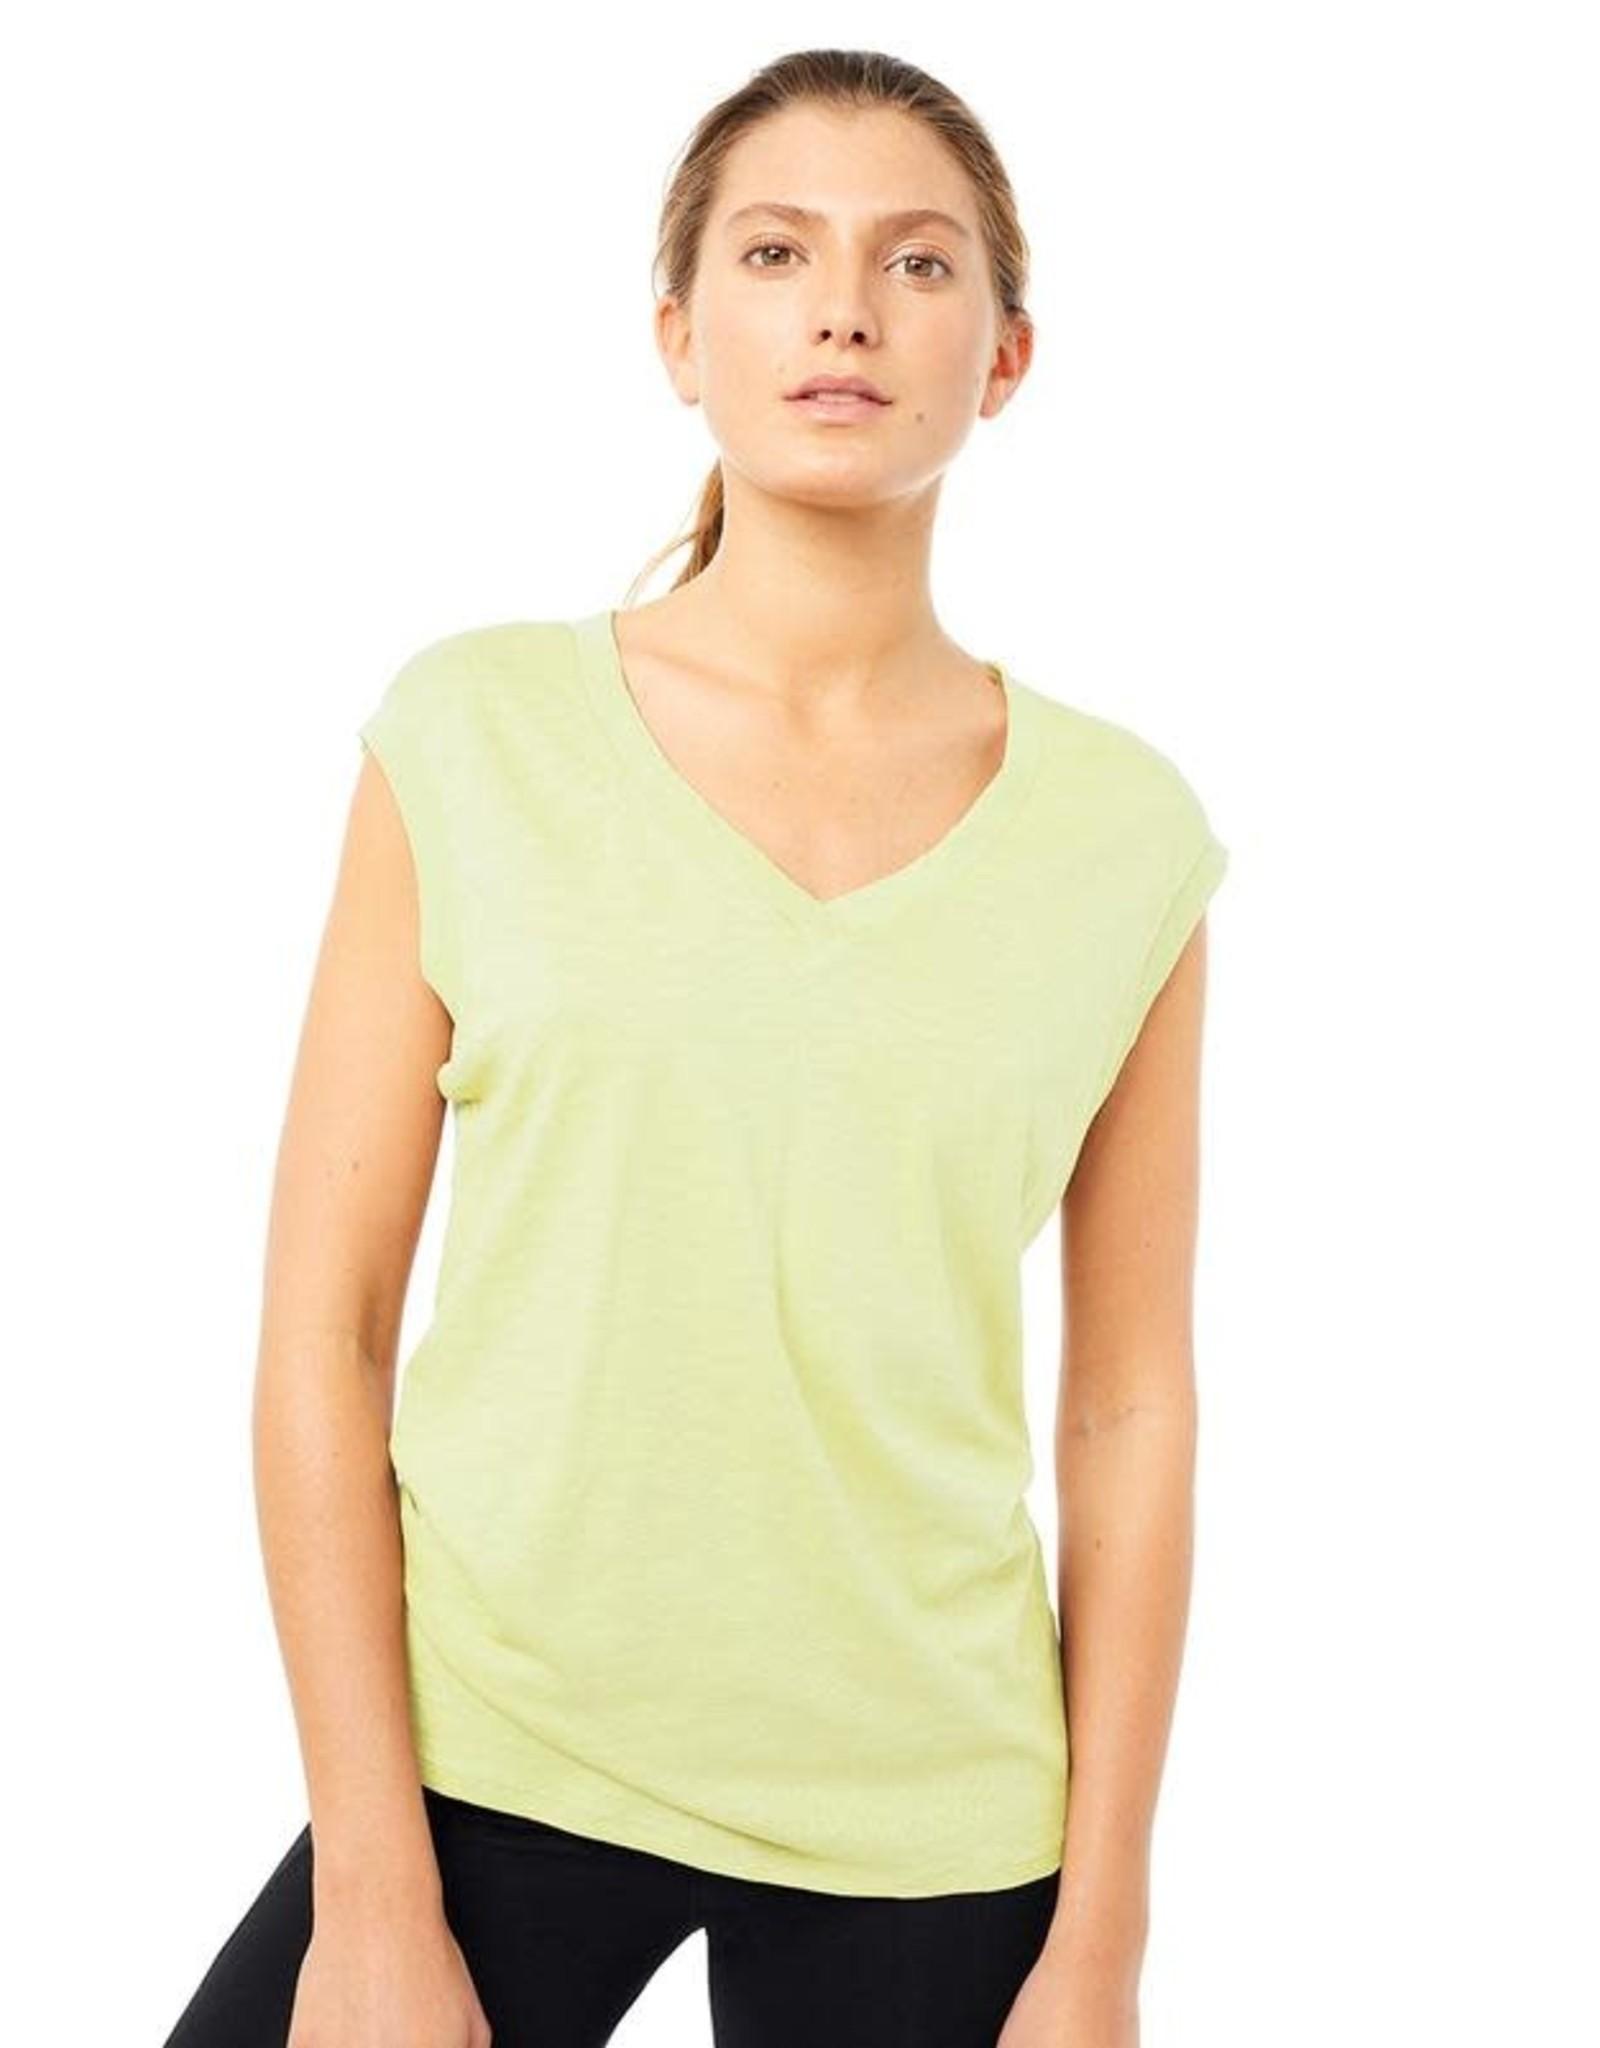 Mandala SS21 Ribbed V-neck Shirt